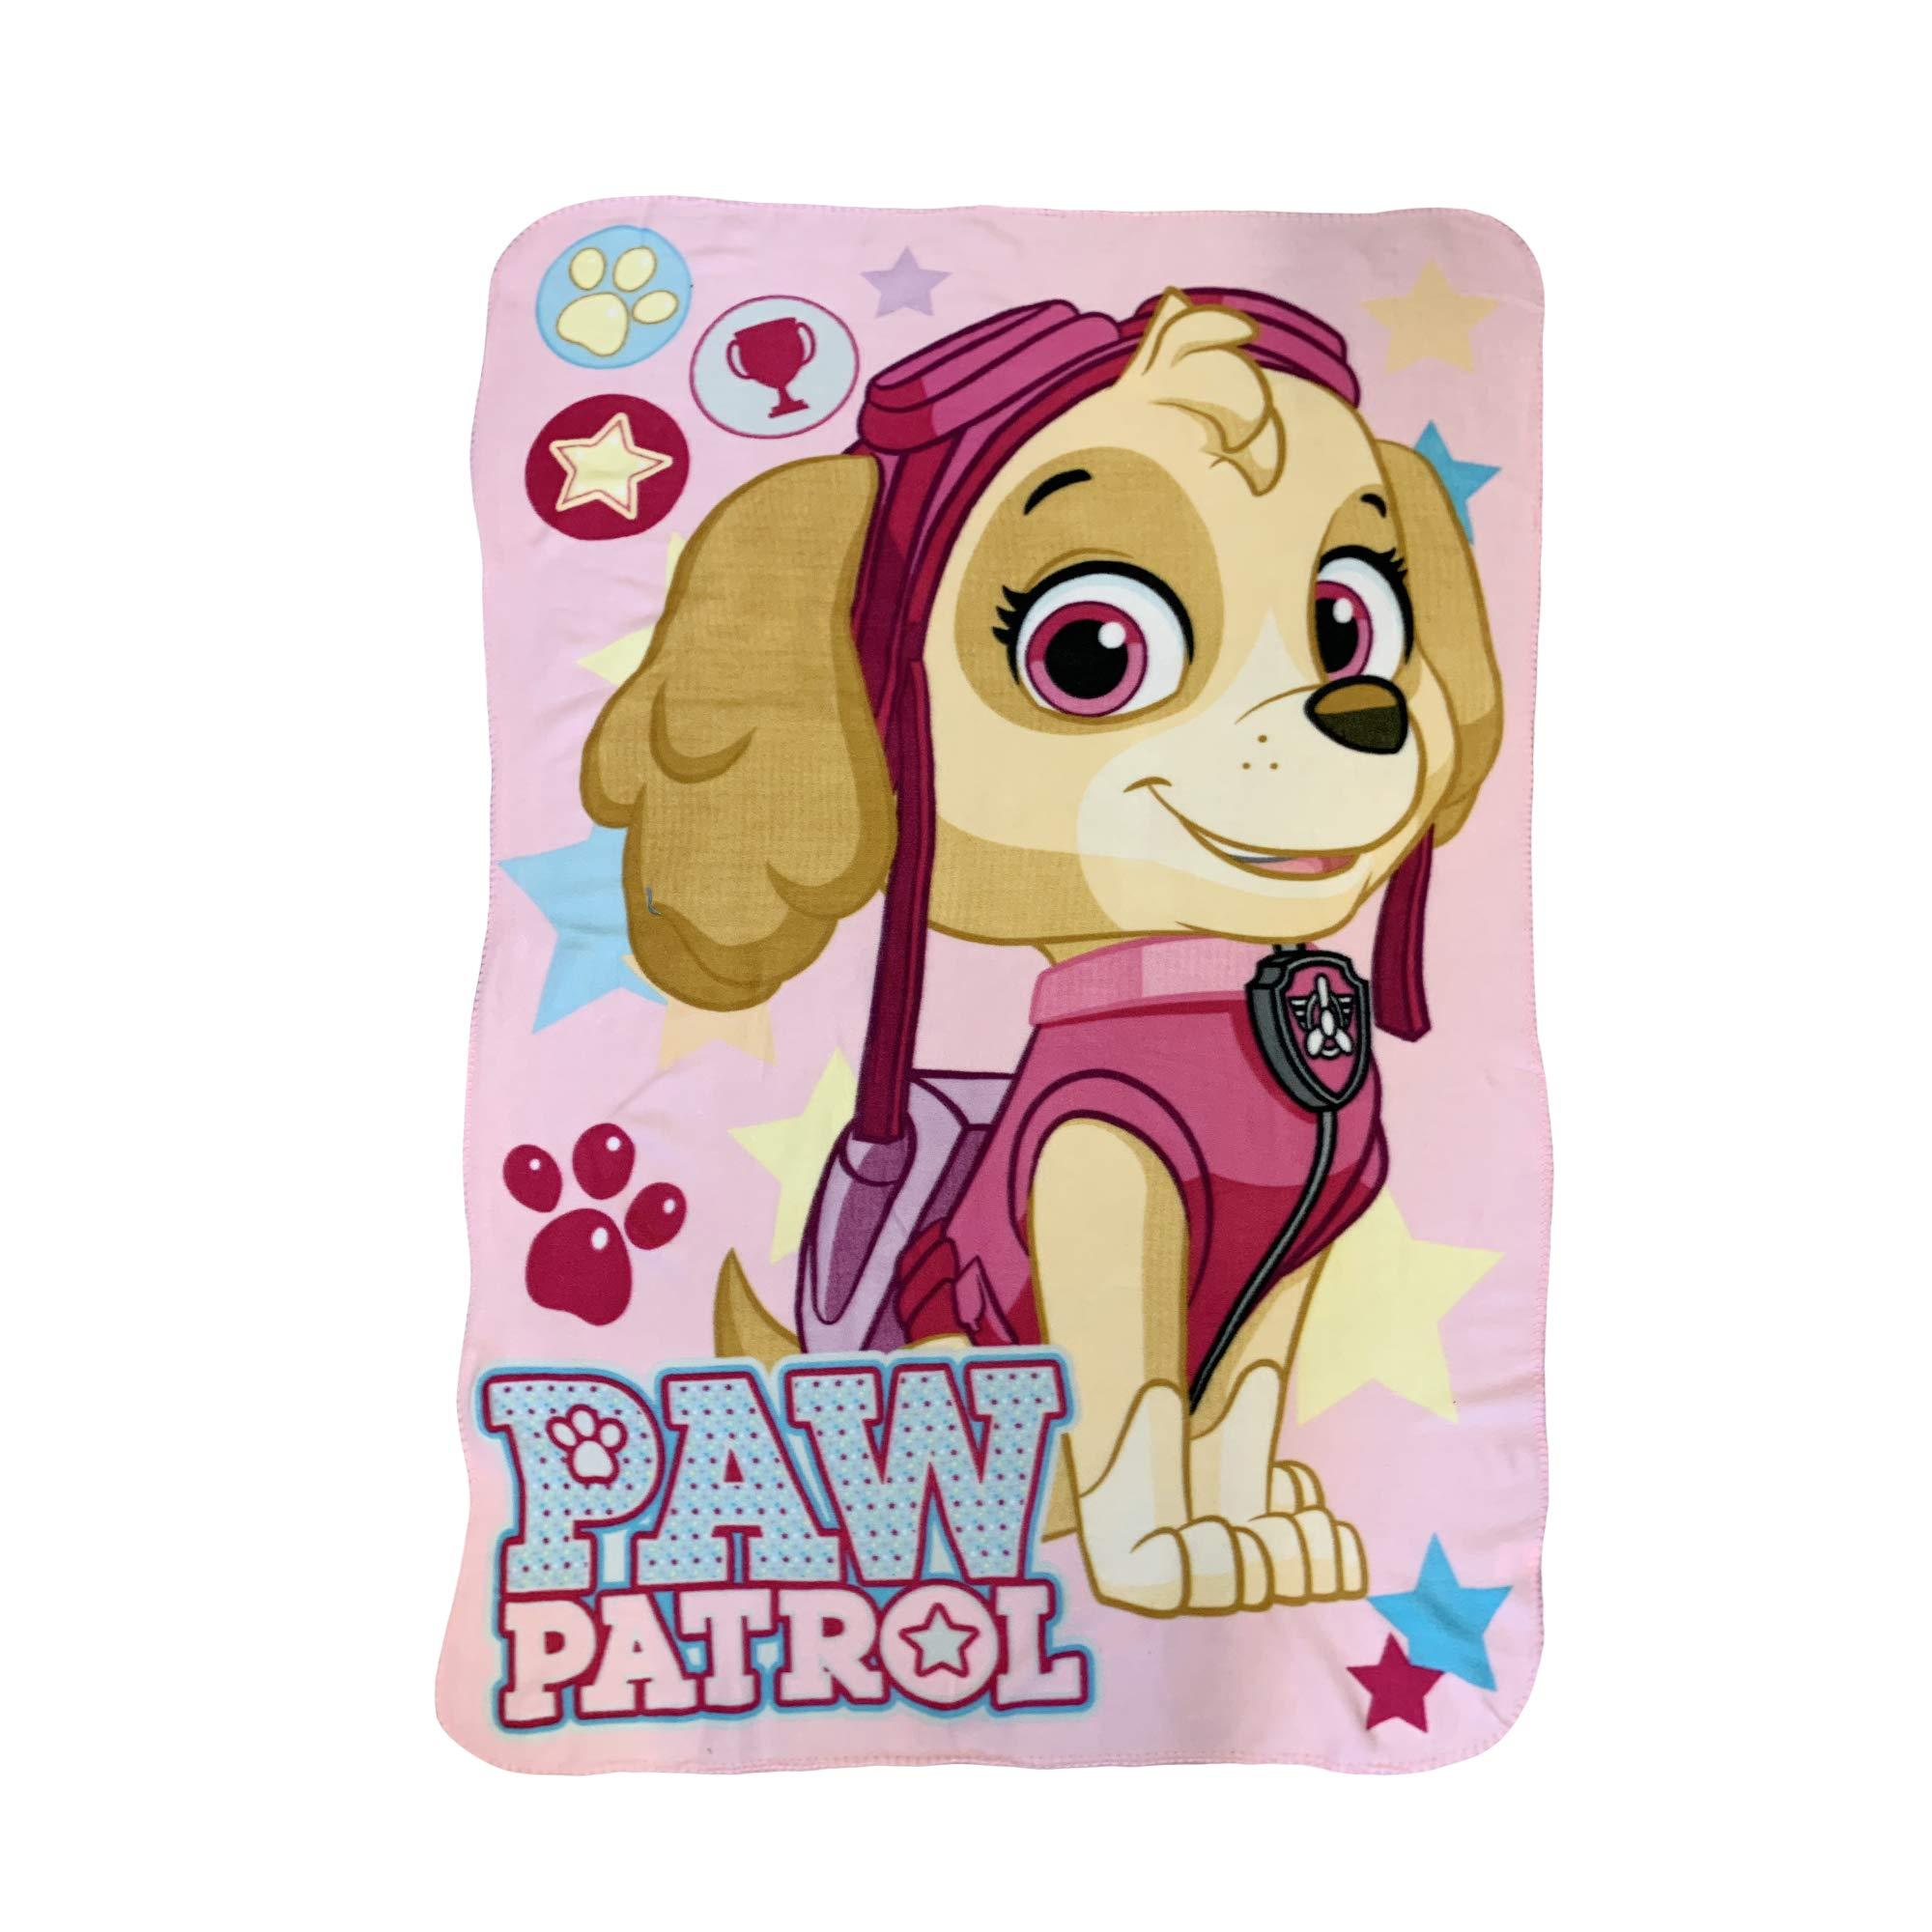 Girl Paw Patrol Skye with Doggy Prints and Stars Throw Blankets by Paw'Patrol